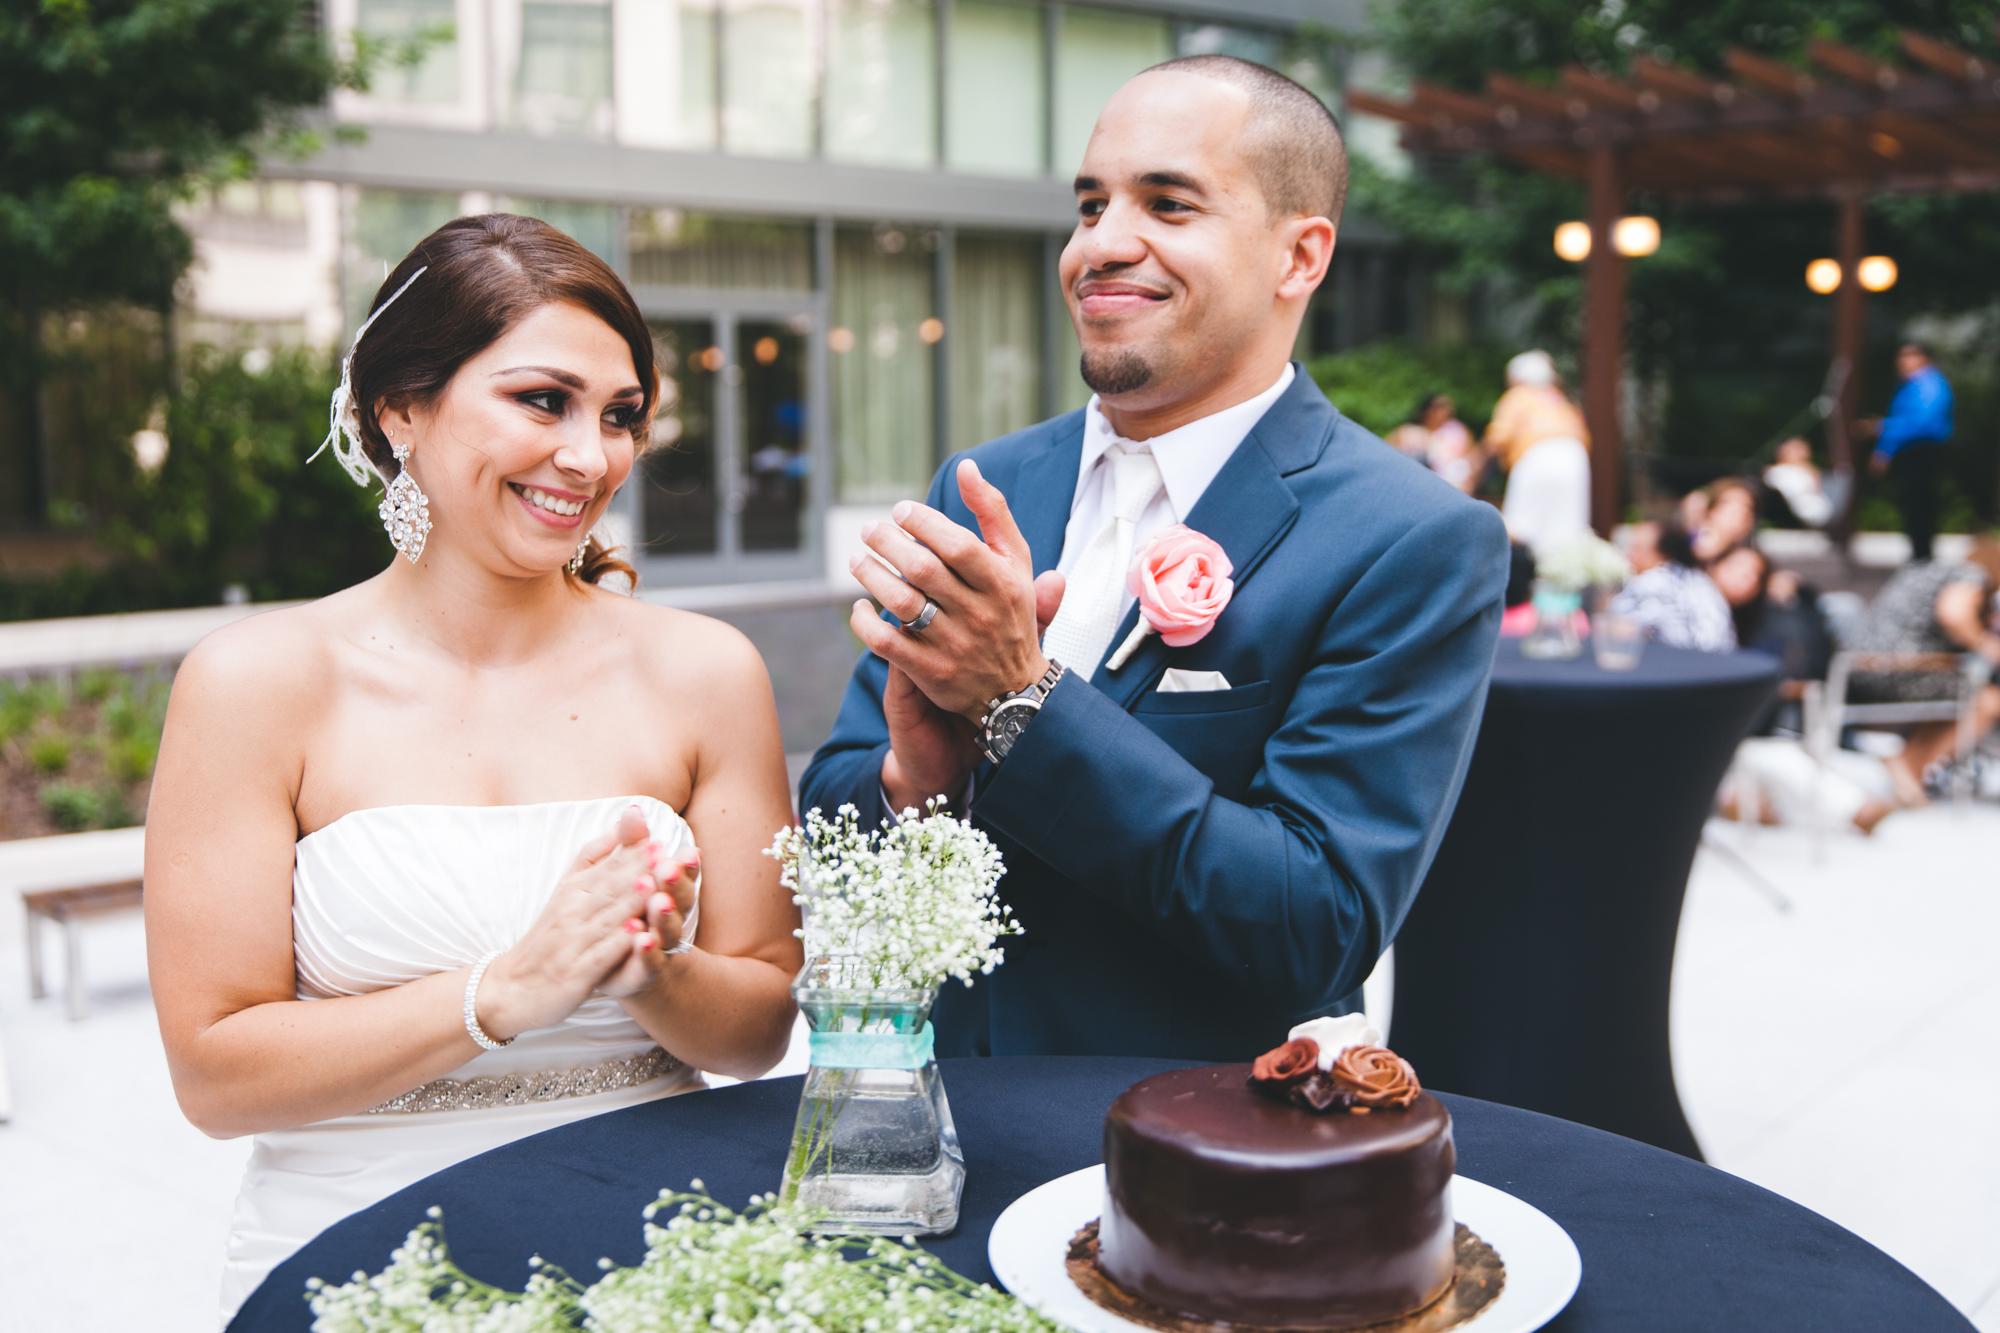 PriscillaJeffrey-Central-Park-Wedding-Elopement-Photography-NYC-55.jpg